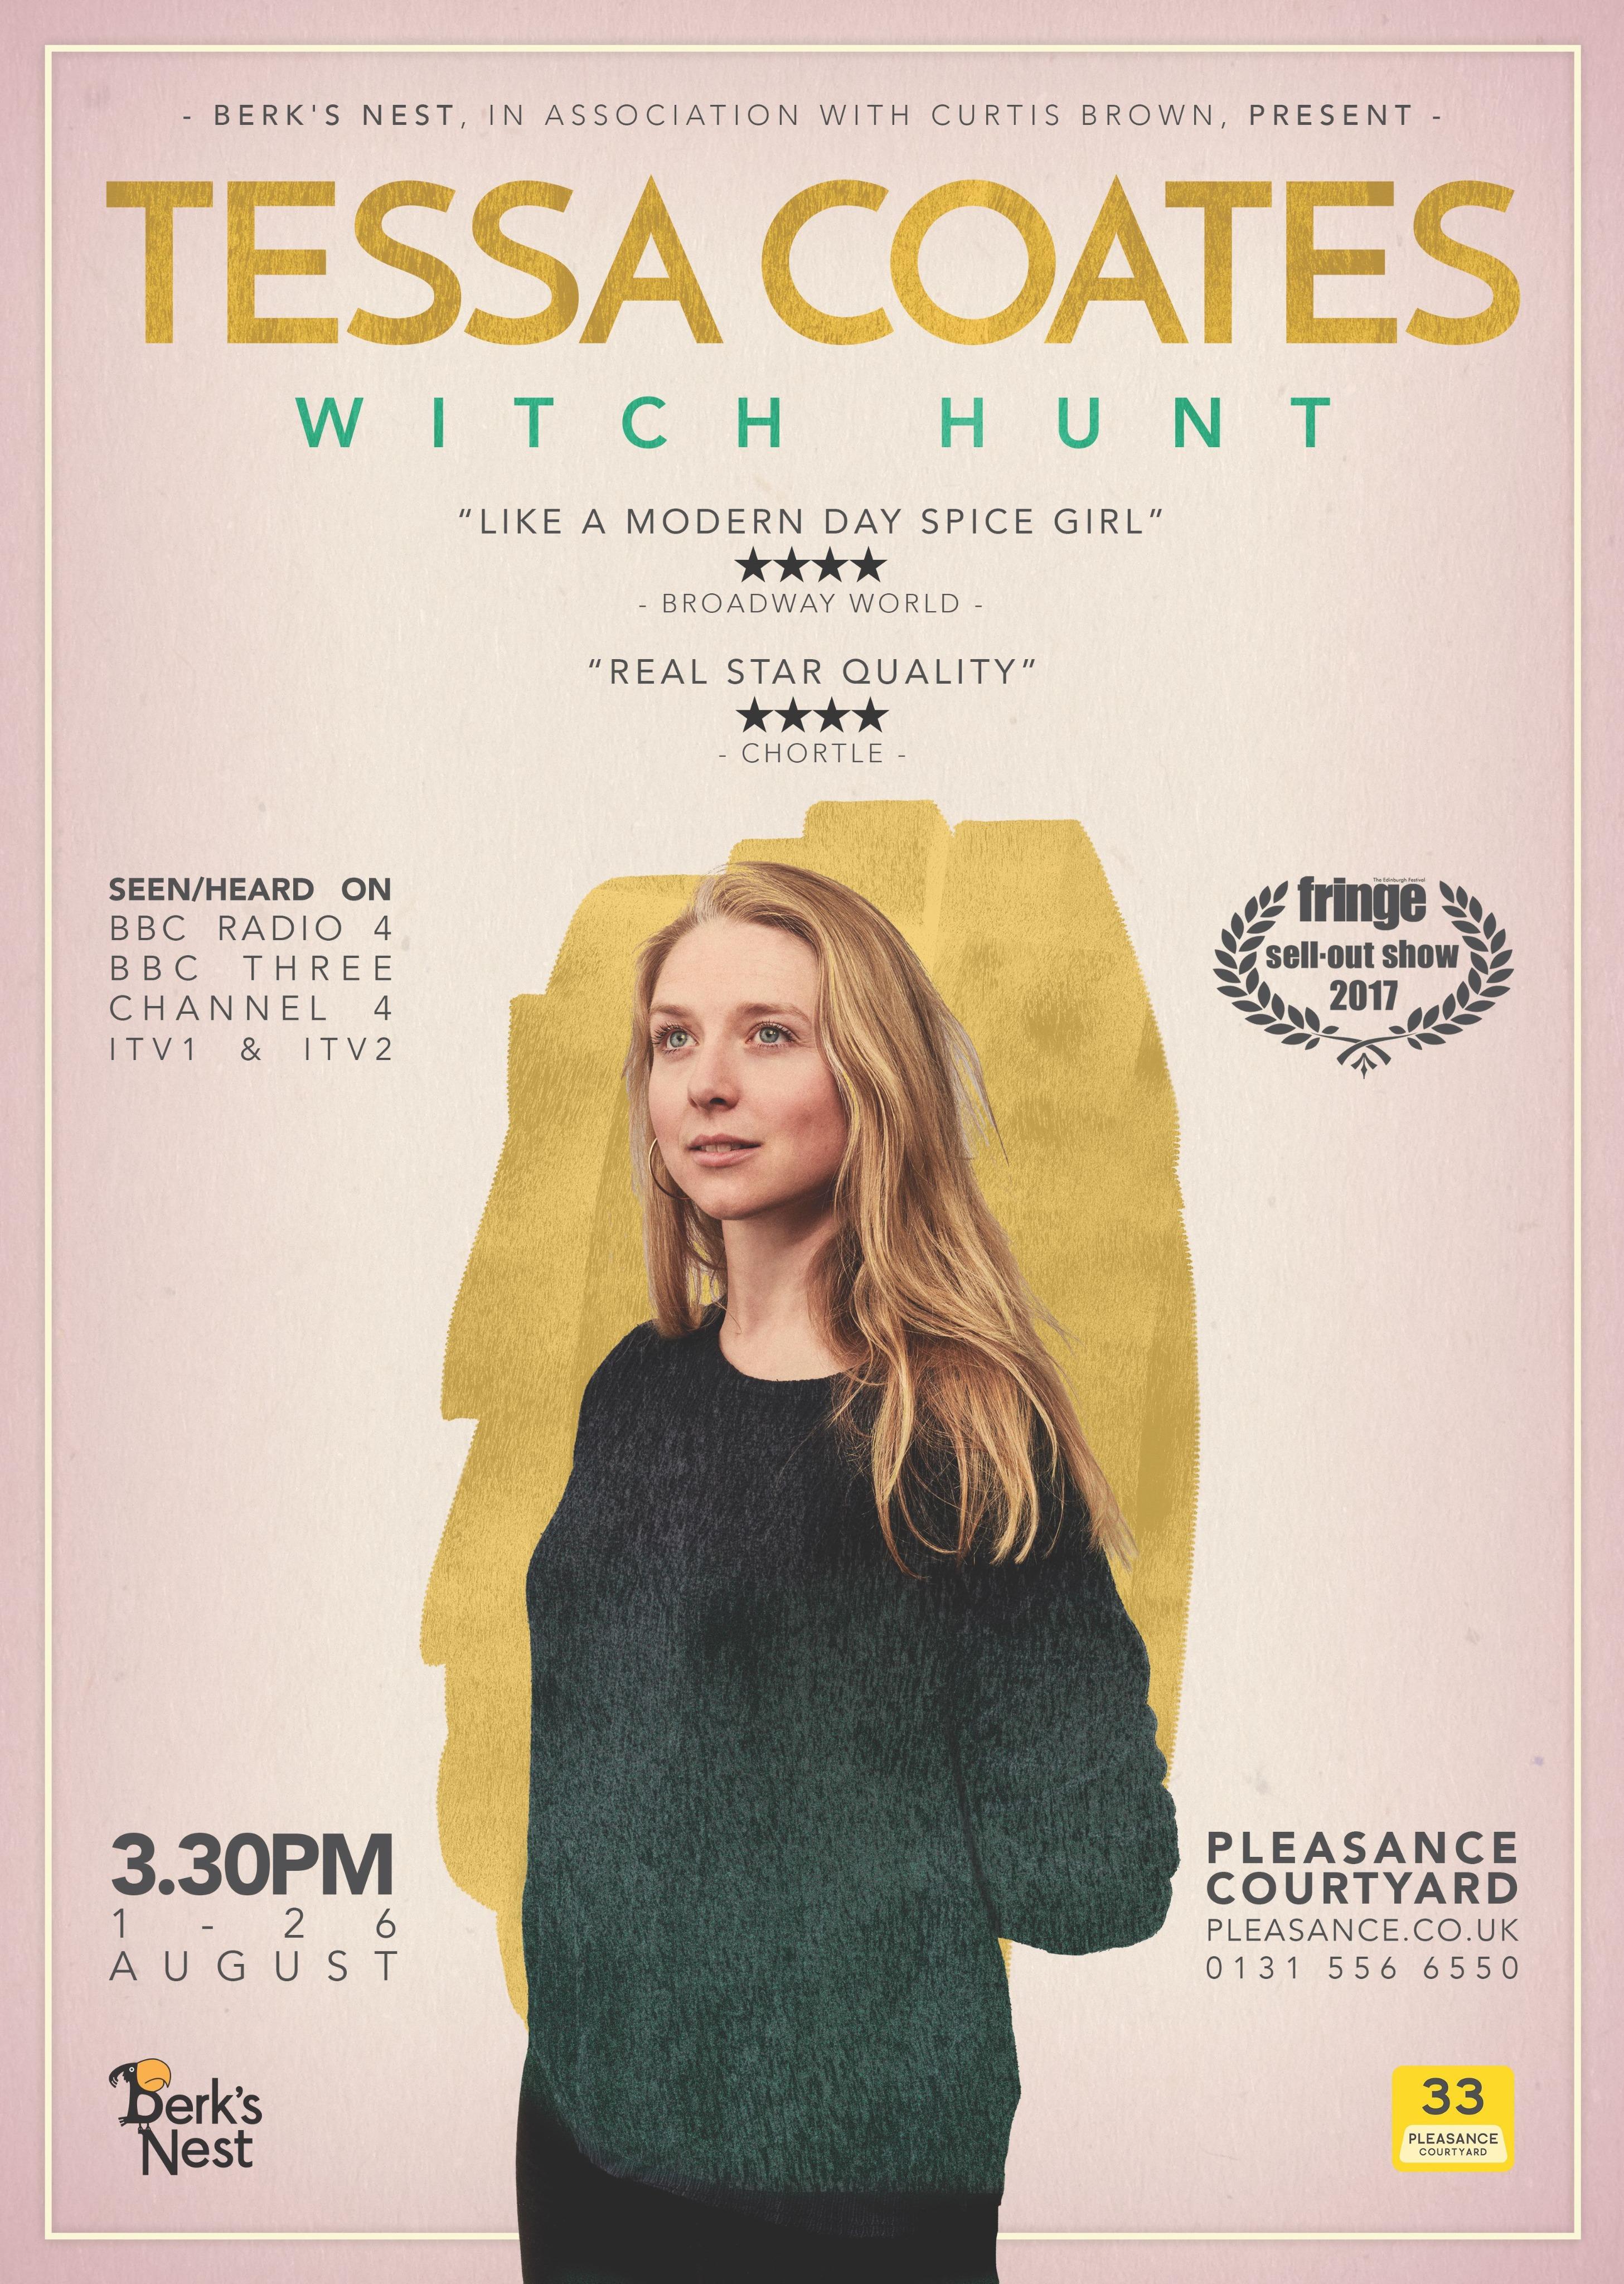 Tessa Coates Poster 2018